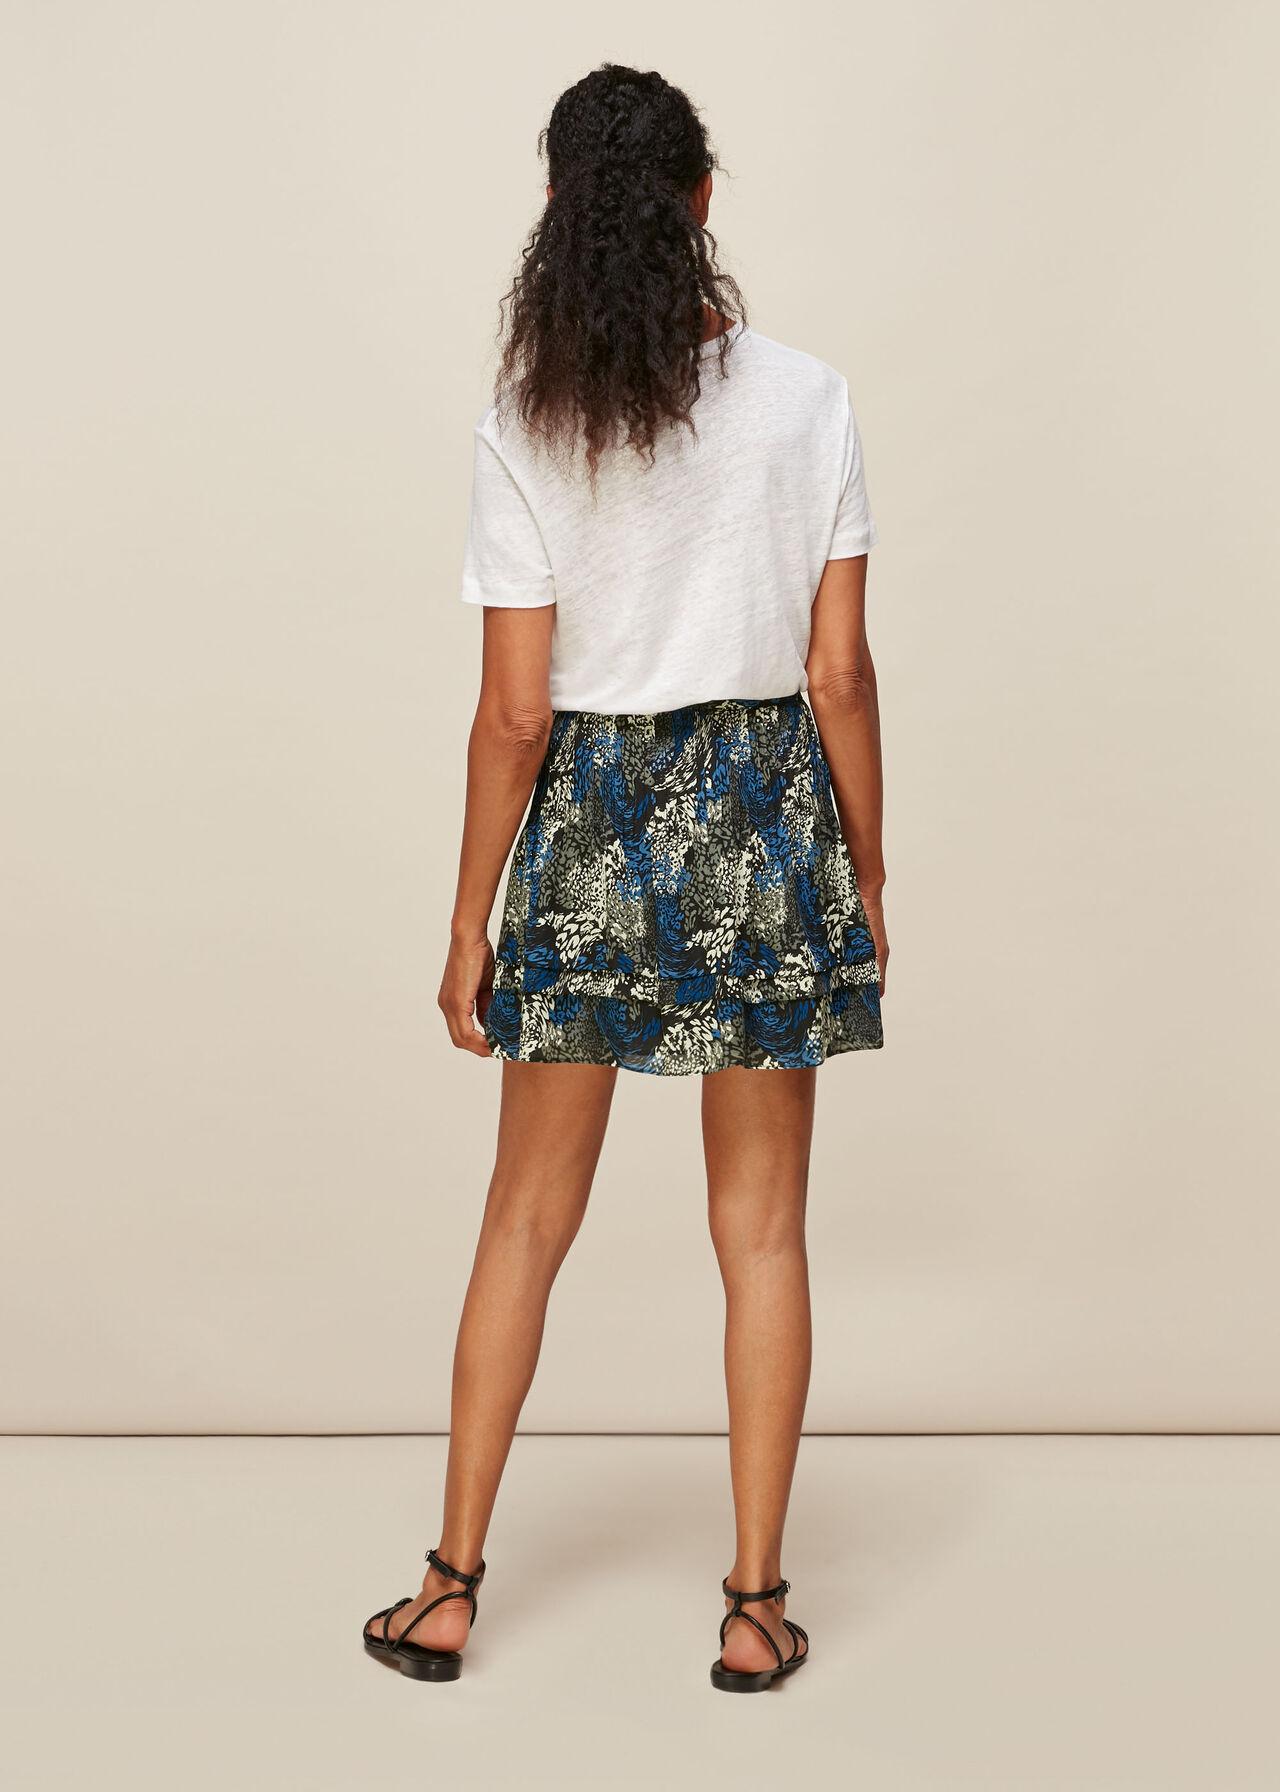 Marble Animal Print Silk Skirt